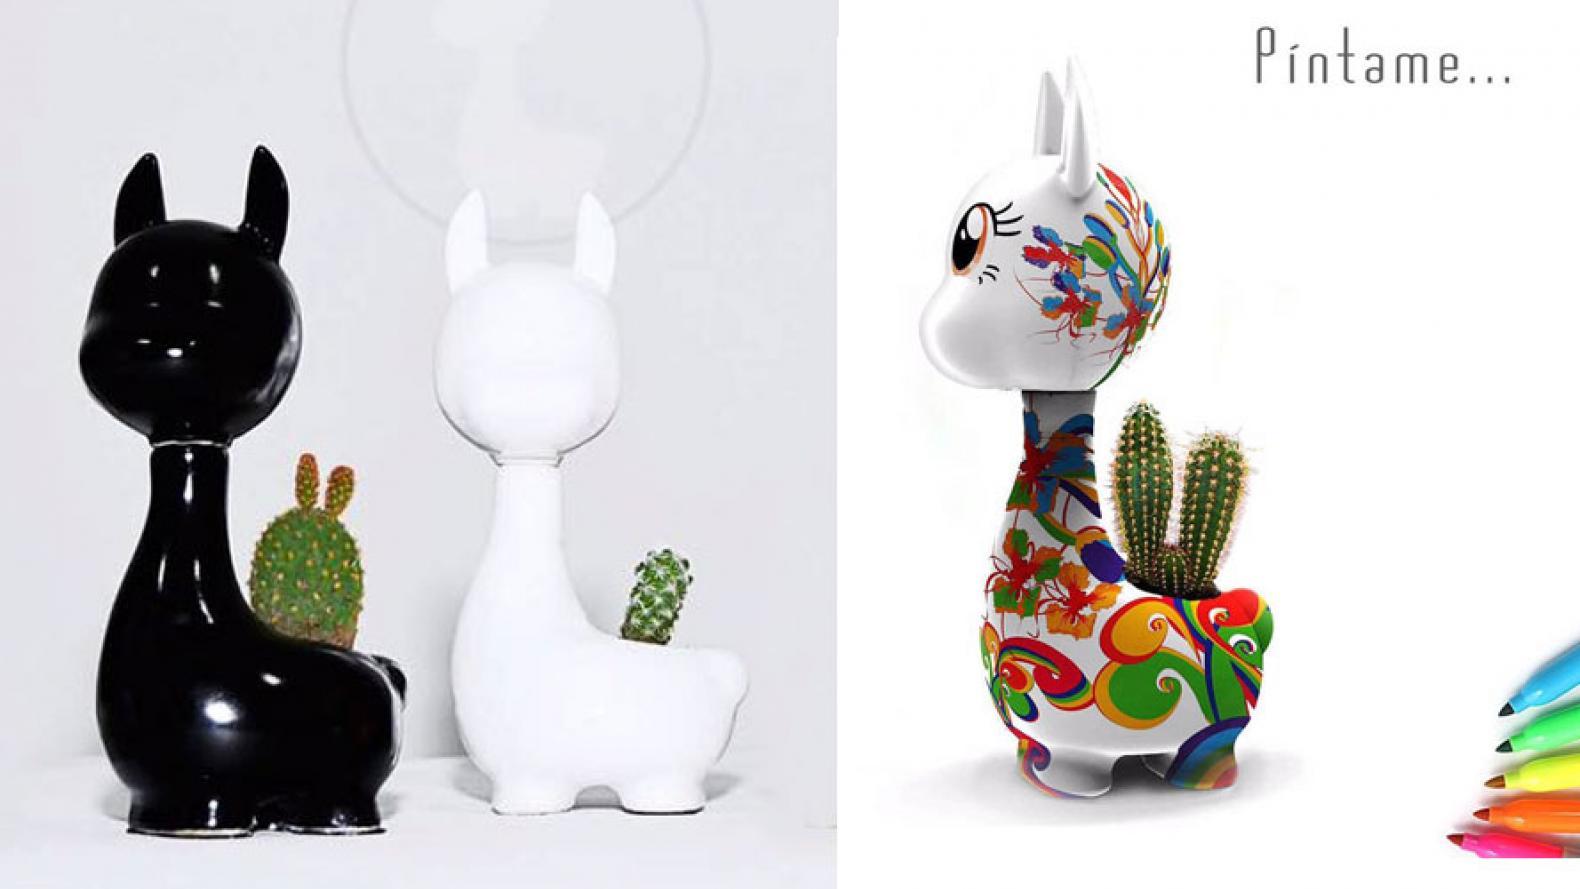 Decoraci n con peque os objetos de cer mica musa - Ceramica decoracion ...